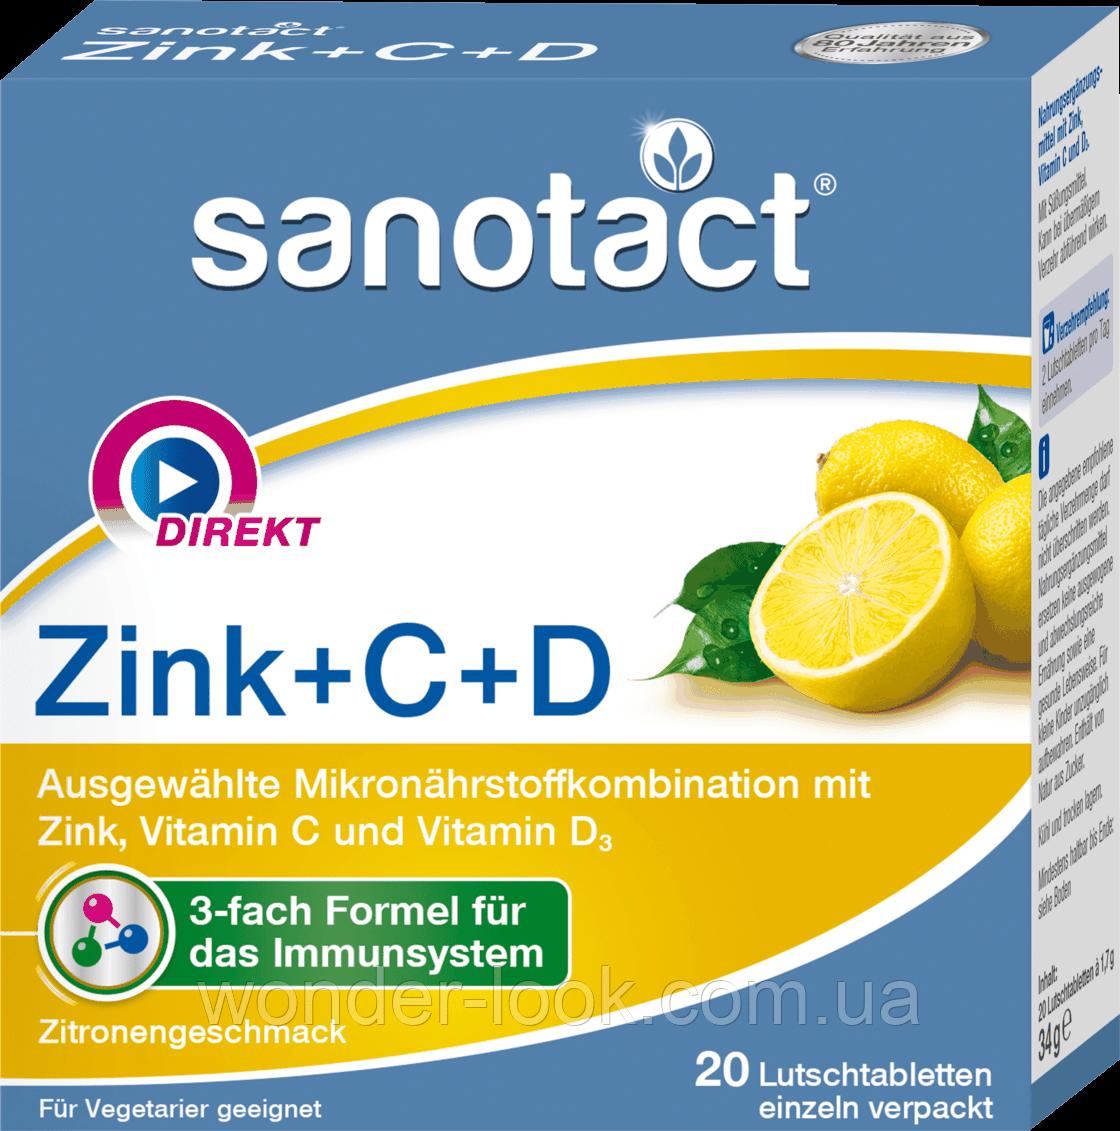 Sanotact Zink+C+D3 витамины Германия